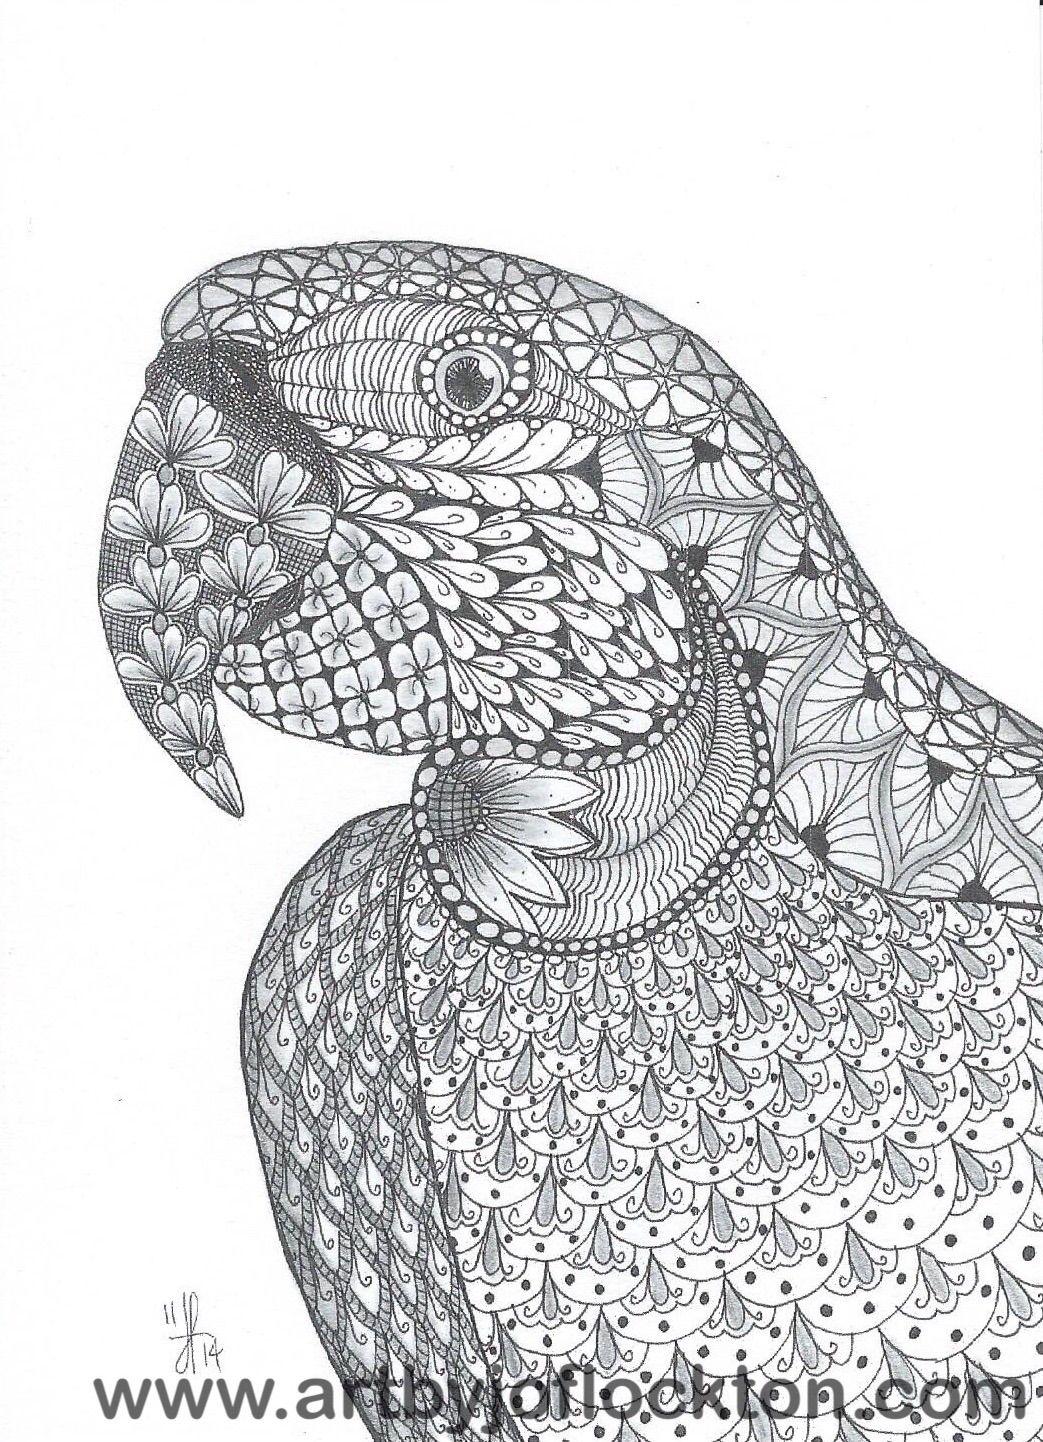 Tangled Parrot, original art, $19.25 | Libros para colorear ...